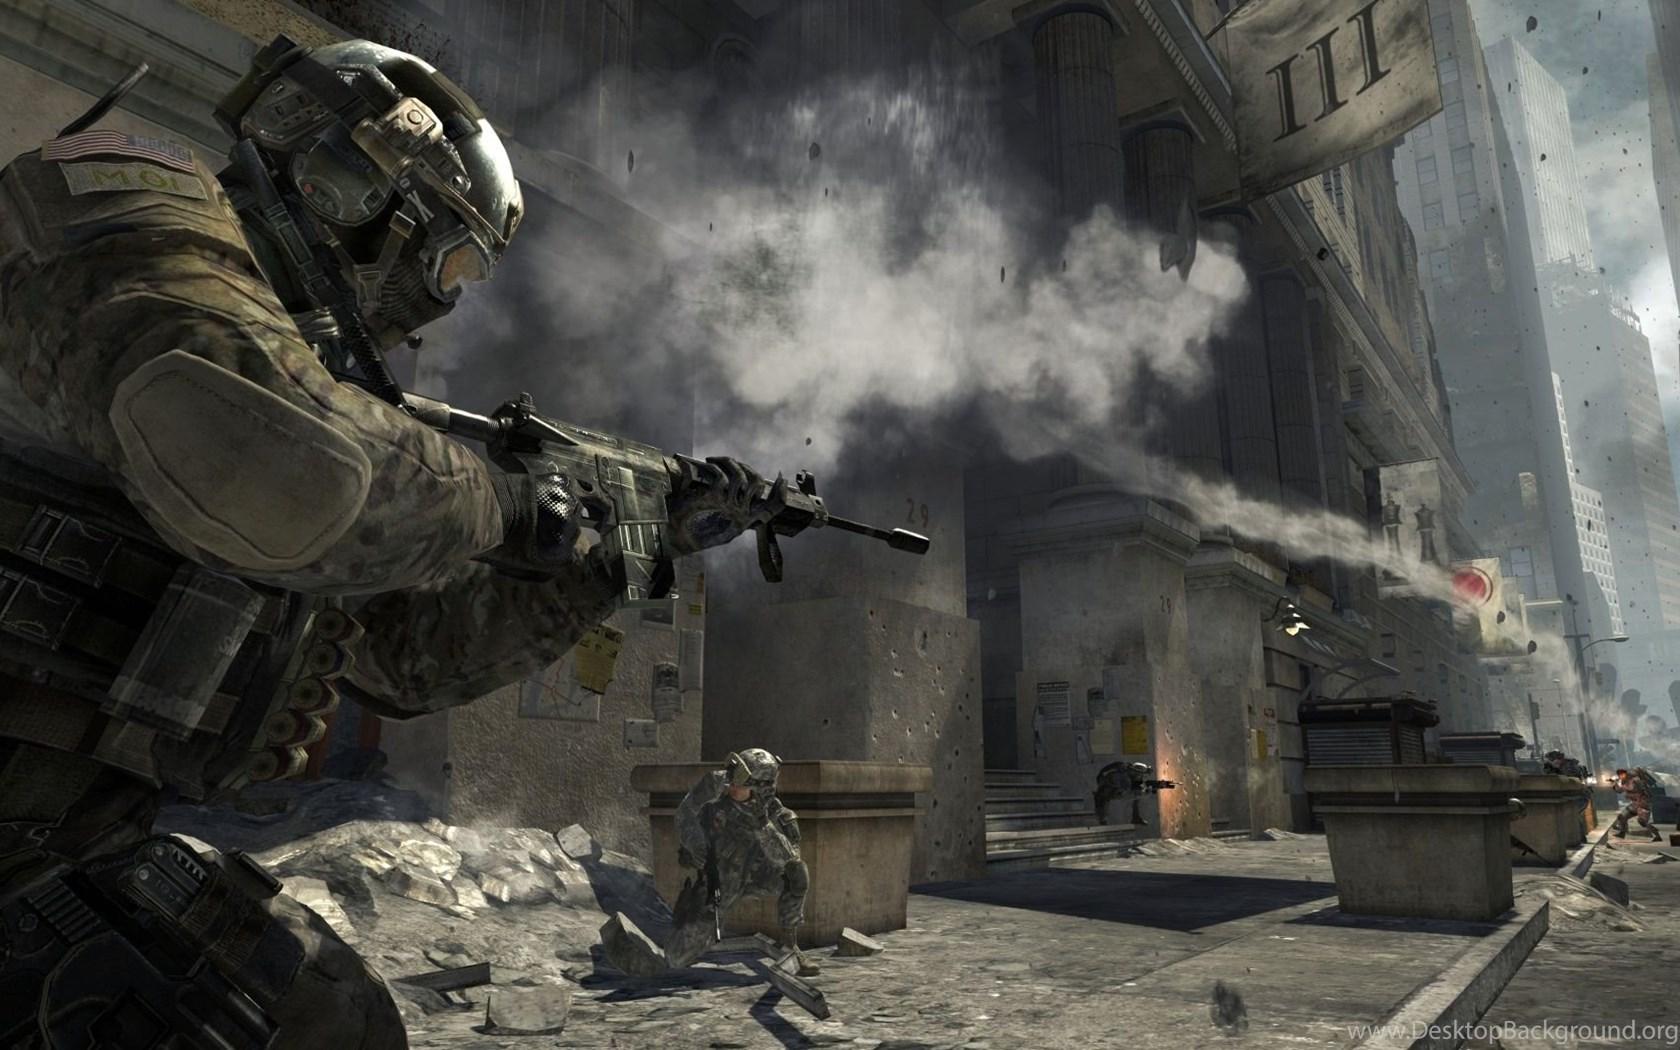 Call Of Duty Modern Warfare 3 Wallpapers Desktop Background